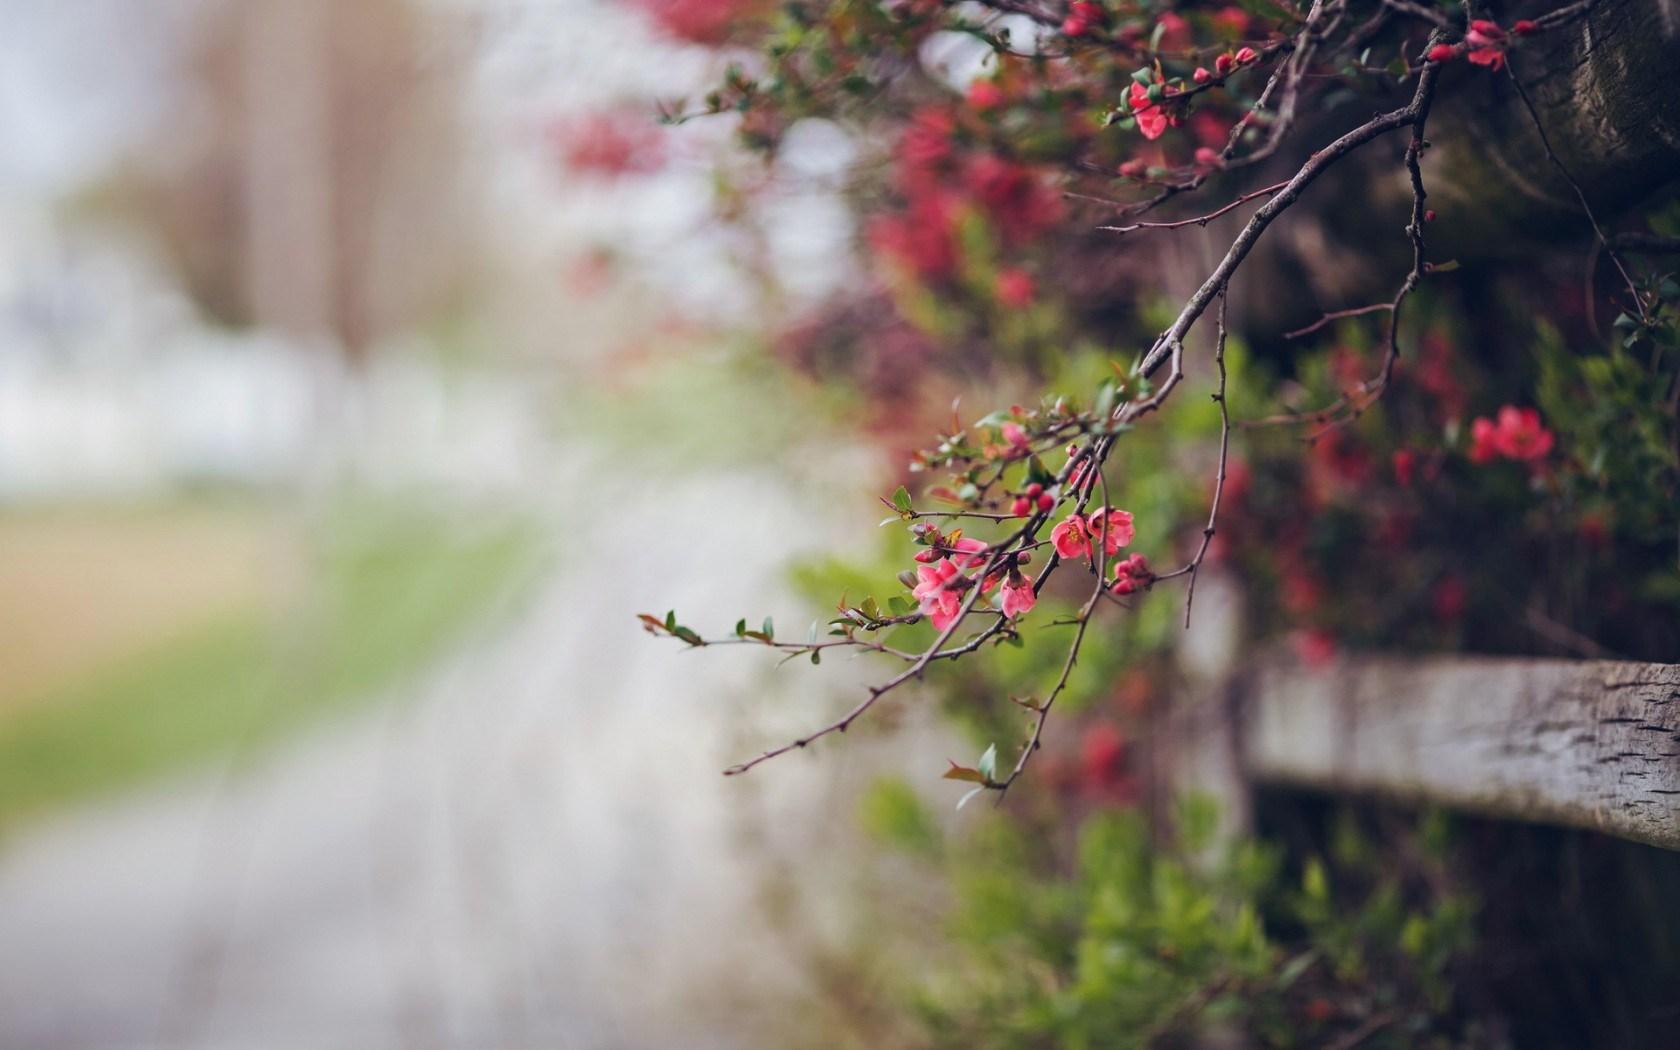 Raindrops 3d Live Wallpaper Flowers Macro Nature Hd Desktop Wallpapers 4k Hd